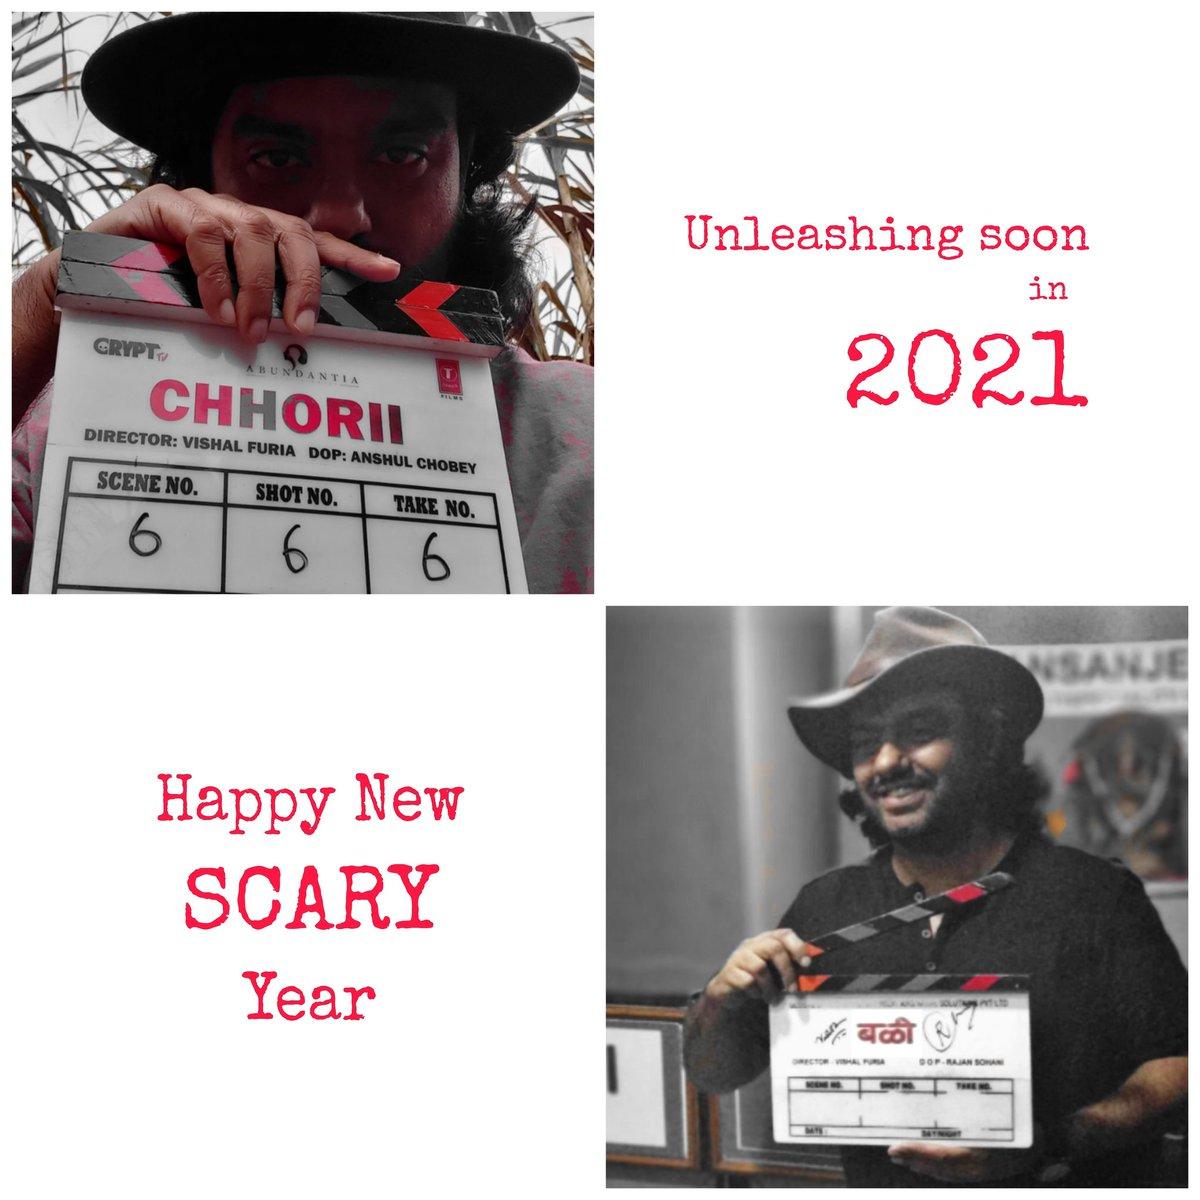 """Bali बळी-the victim"" starring @swwapniljoshi Produced by @Kartikgseams @arjunsbaran @Gseamsak  ""Chhorii"" starring @Nushrratt Produced by @vikramix @NotJackDavis #BhushanKumar @Abundantia_Ent @CryptTV @tseriesfilms  Releasing in 2021...💀💀💀  #horror #film #cinema #vishalfuria"